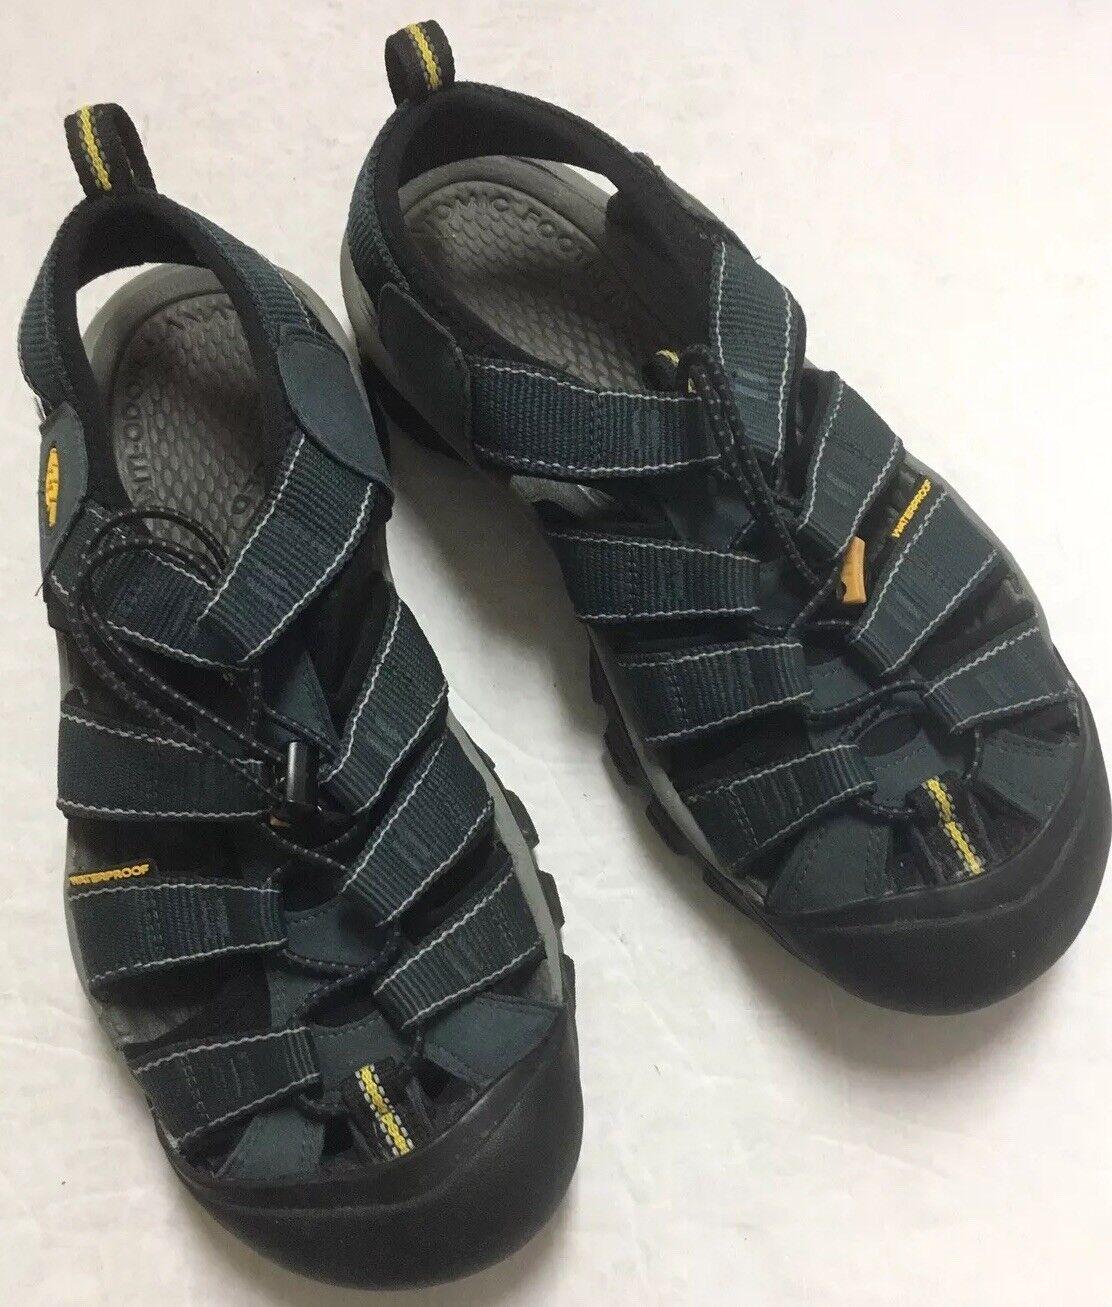 Keen Men's Newport H2 Navy Medium Grey Grey Grey Sandals 1001938 Size 8.5 e2d199